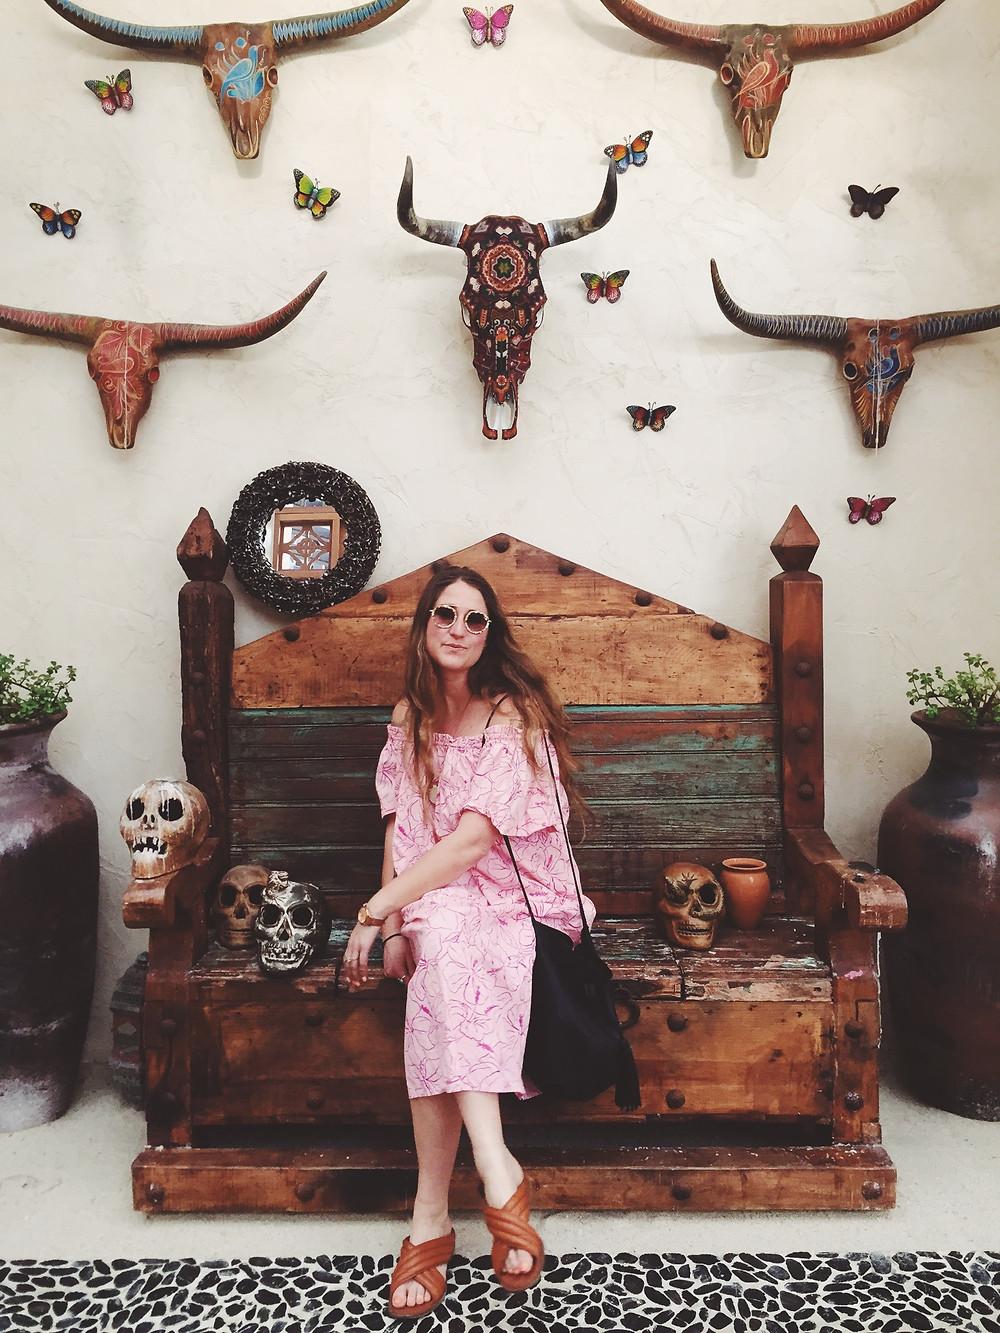 Best Places to Stay in Todos Santos - Emily Katz Travels Todo Santos Mexico - Cabo Casa Calavera